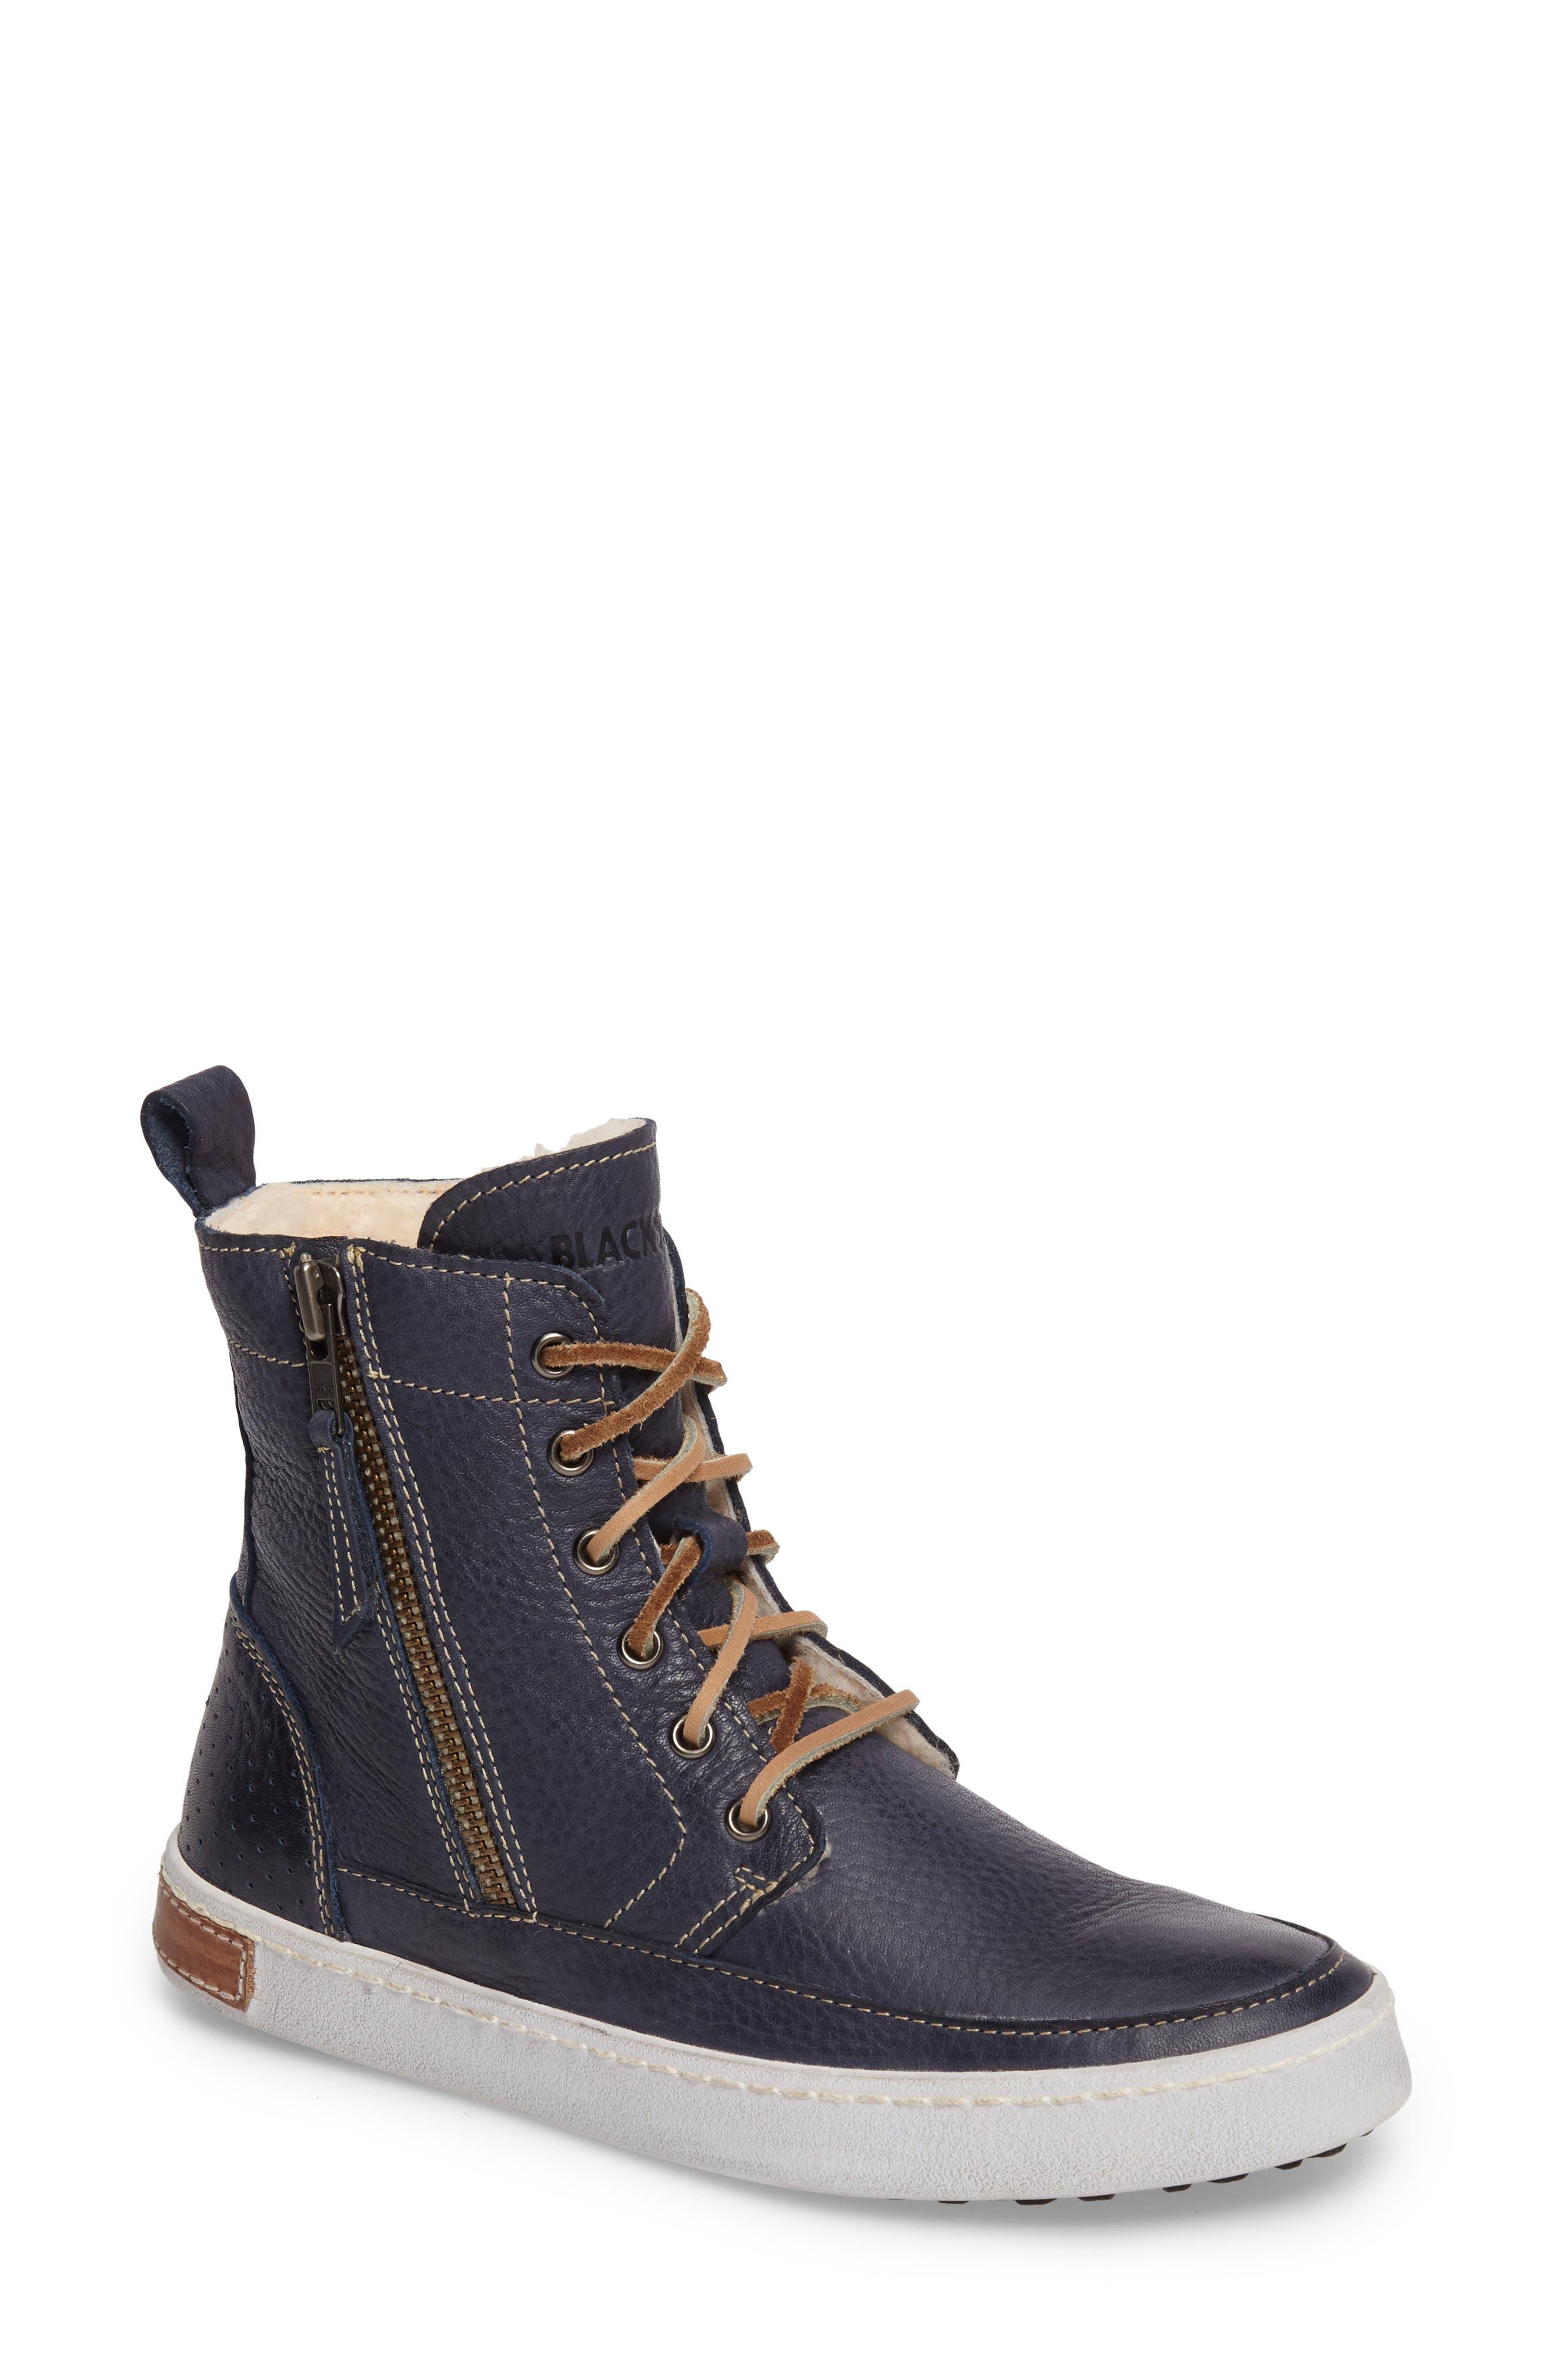 Alternate Image 1 Selected - Blackstone 'CW96' Genuine Shearling Lined Sneaker Boot (Women)